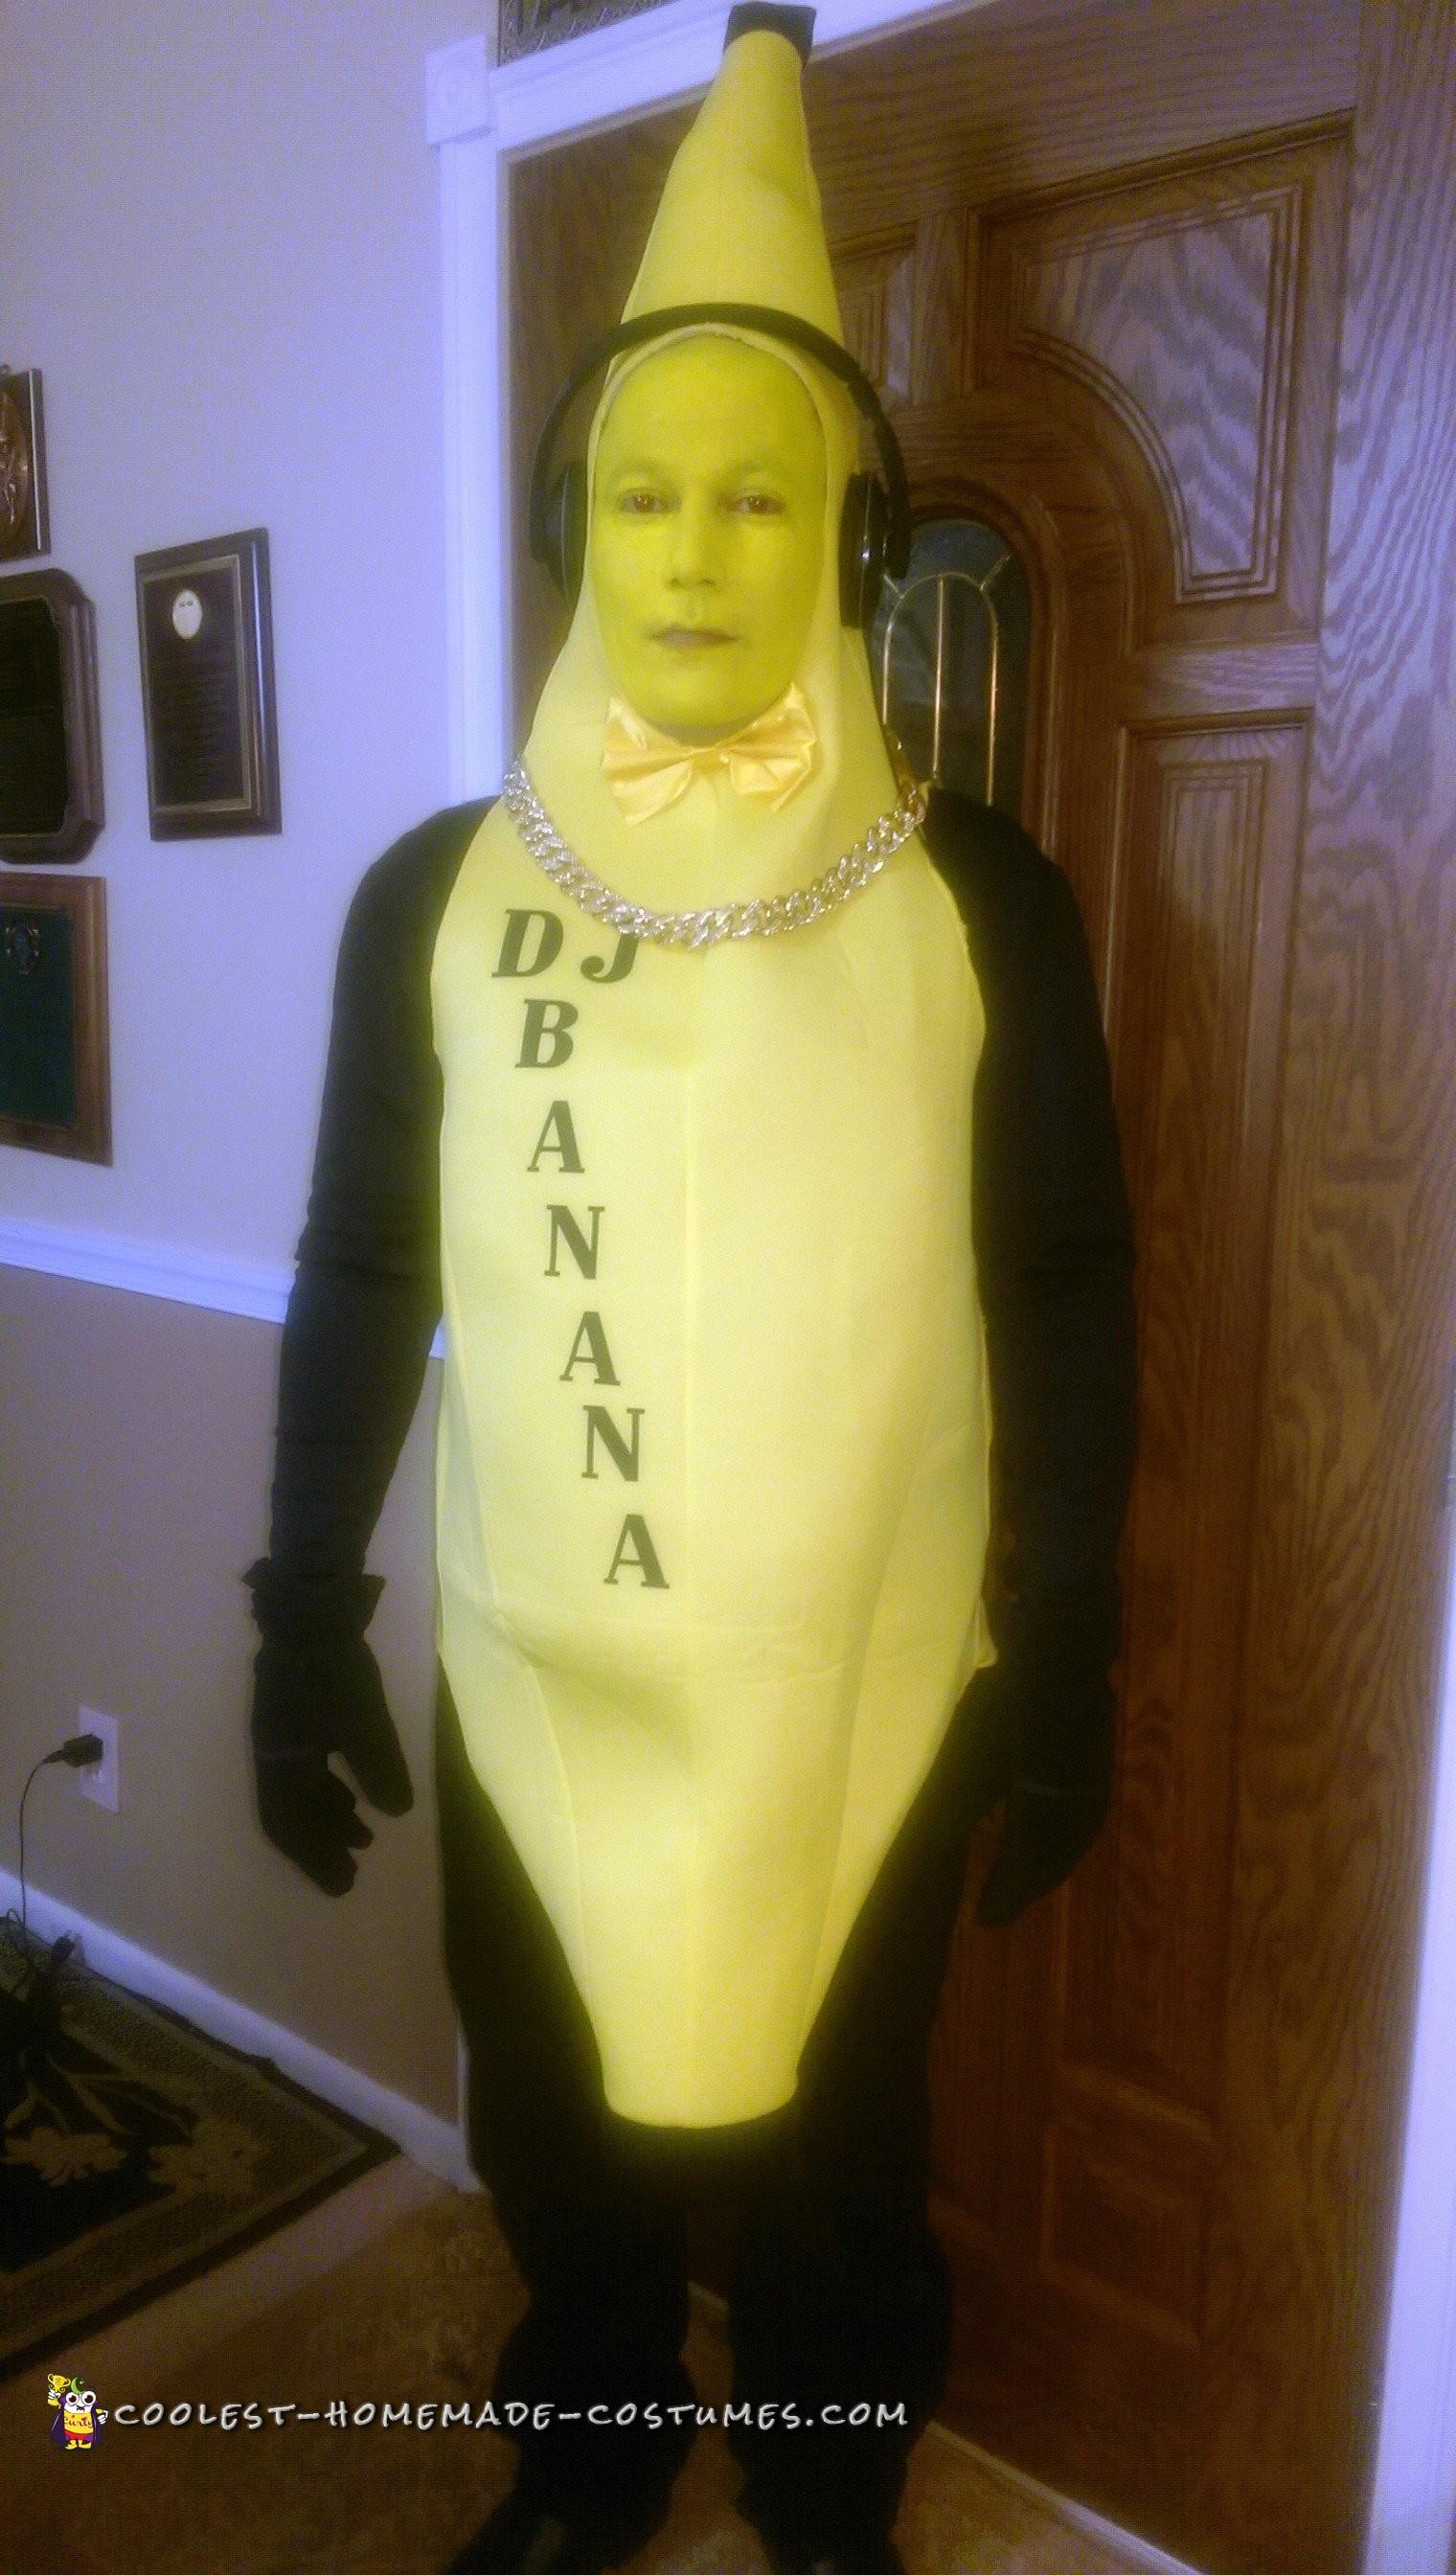 Funny DJ Banana Costume